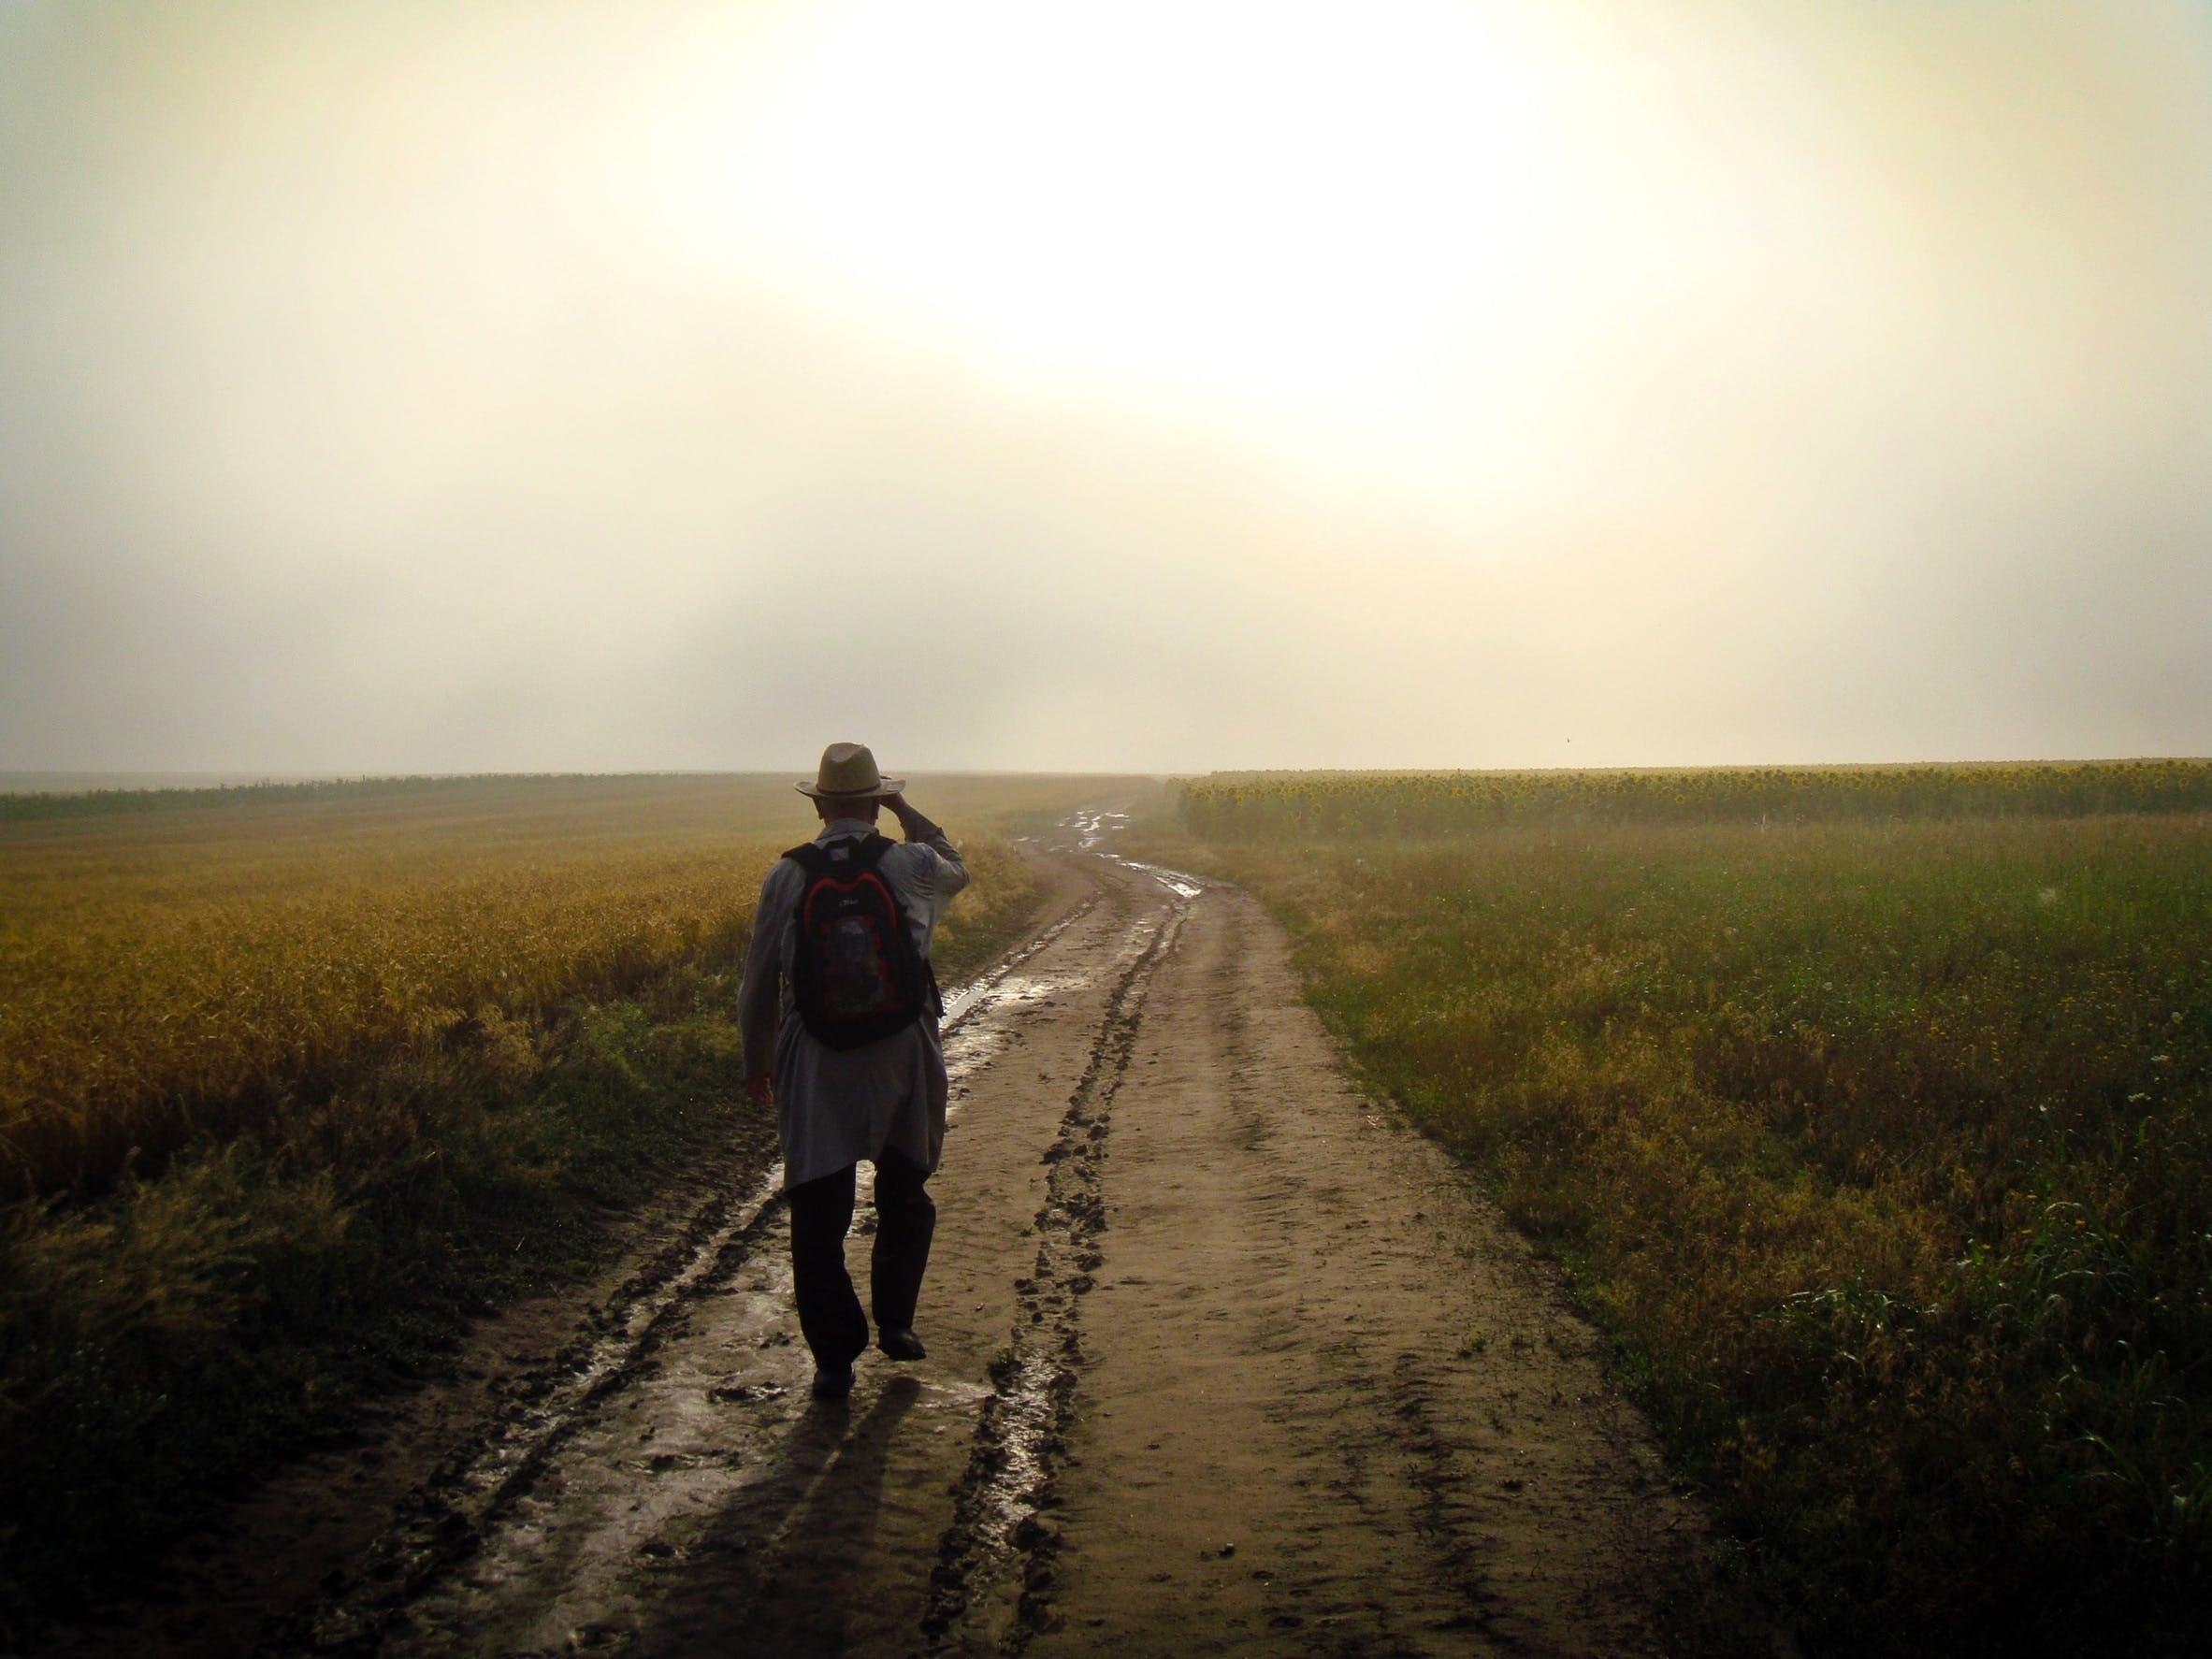 Free stock photo of backpack, dirt, dusk, fields